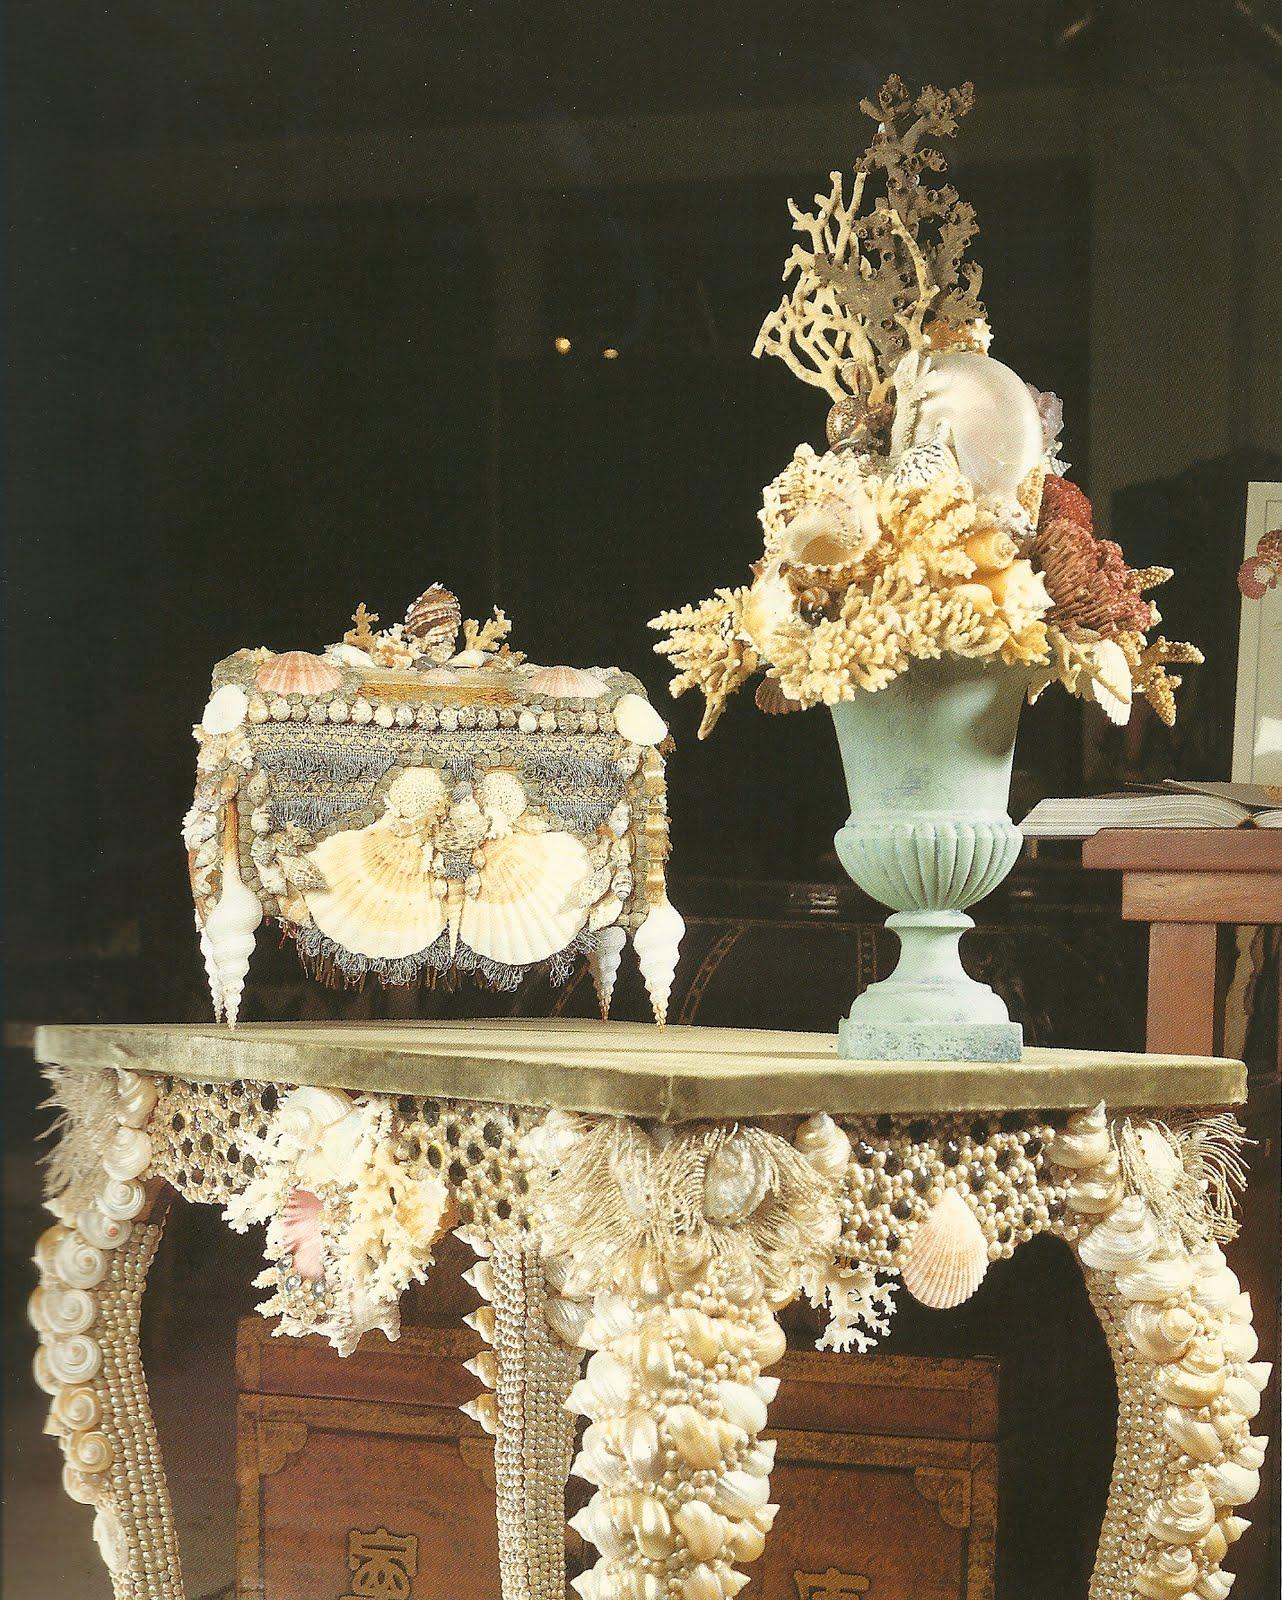 Seashell Home Decor Ideas: 1000+ Ideas About SEASHELL Home Decor On Pinterest